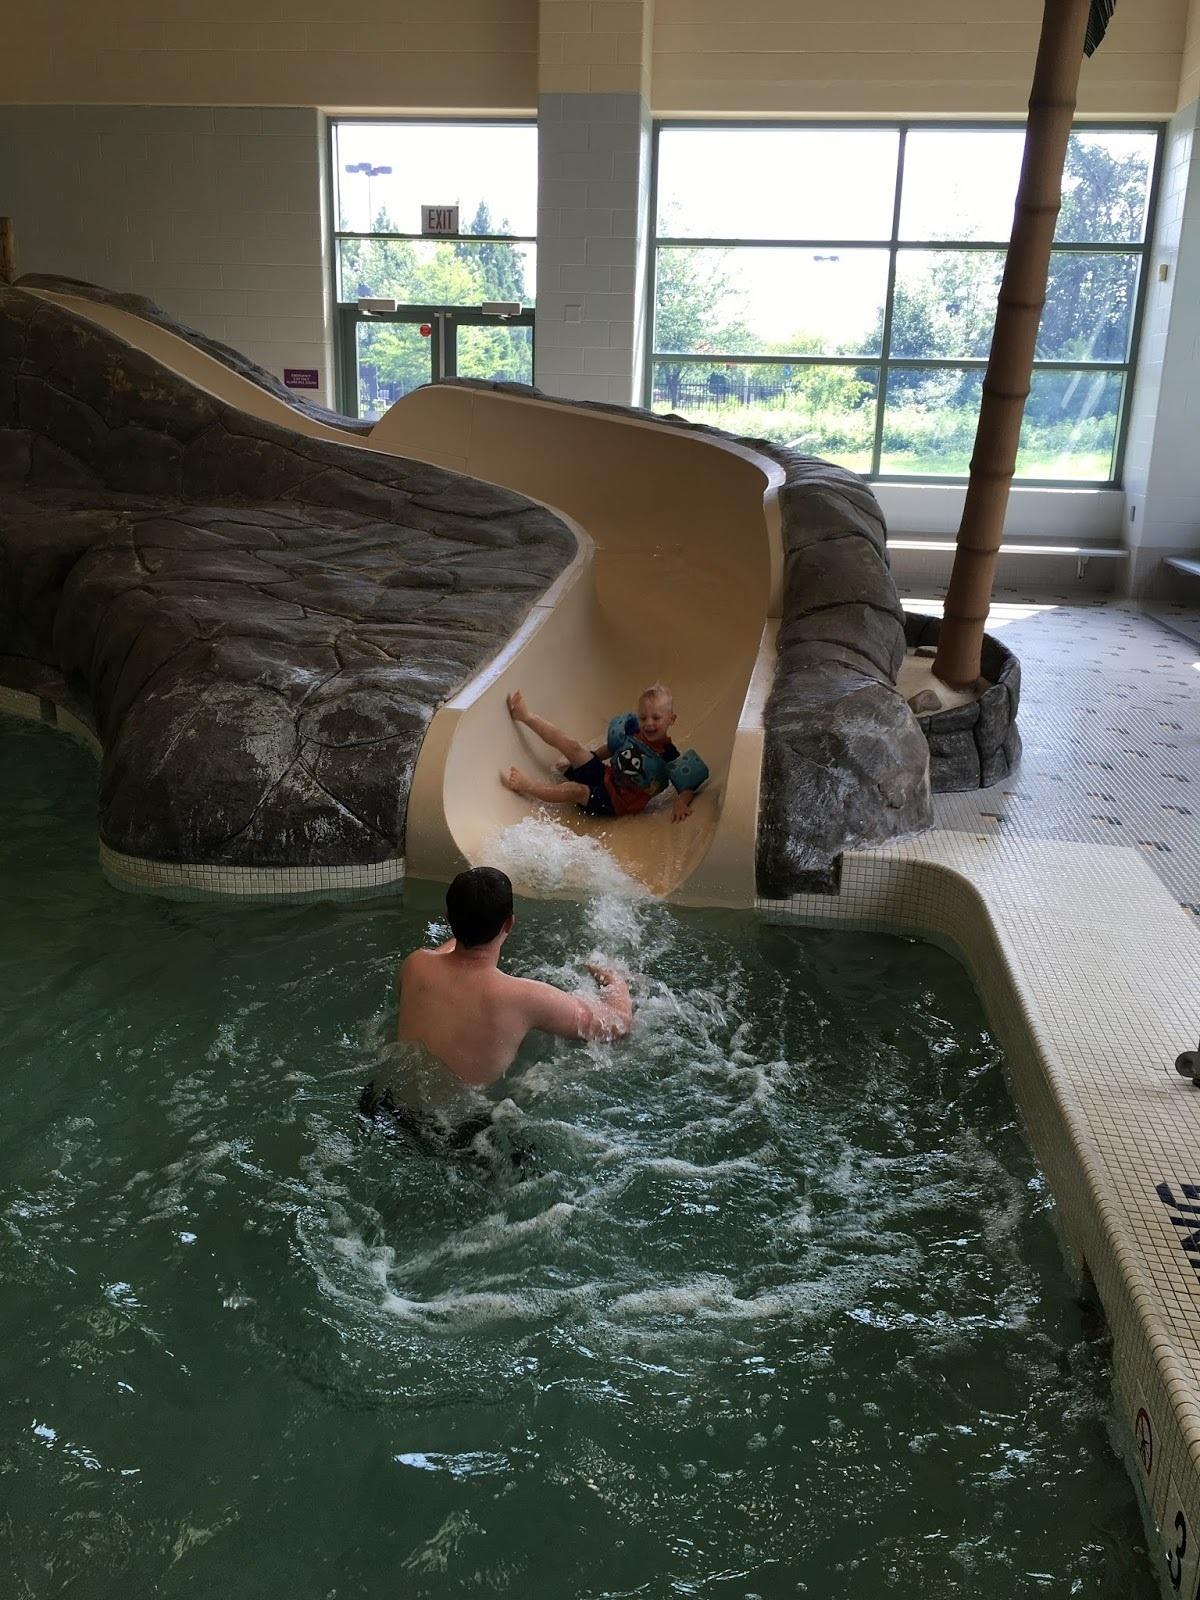 Germantown indoor swim center boyds md kid friendly activity r trekaroo for Germantown indoor swimming pool